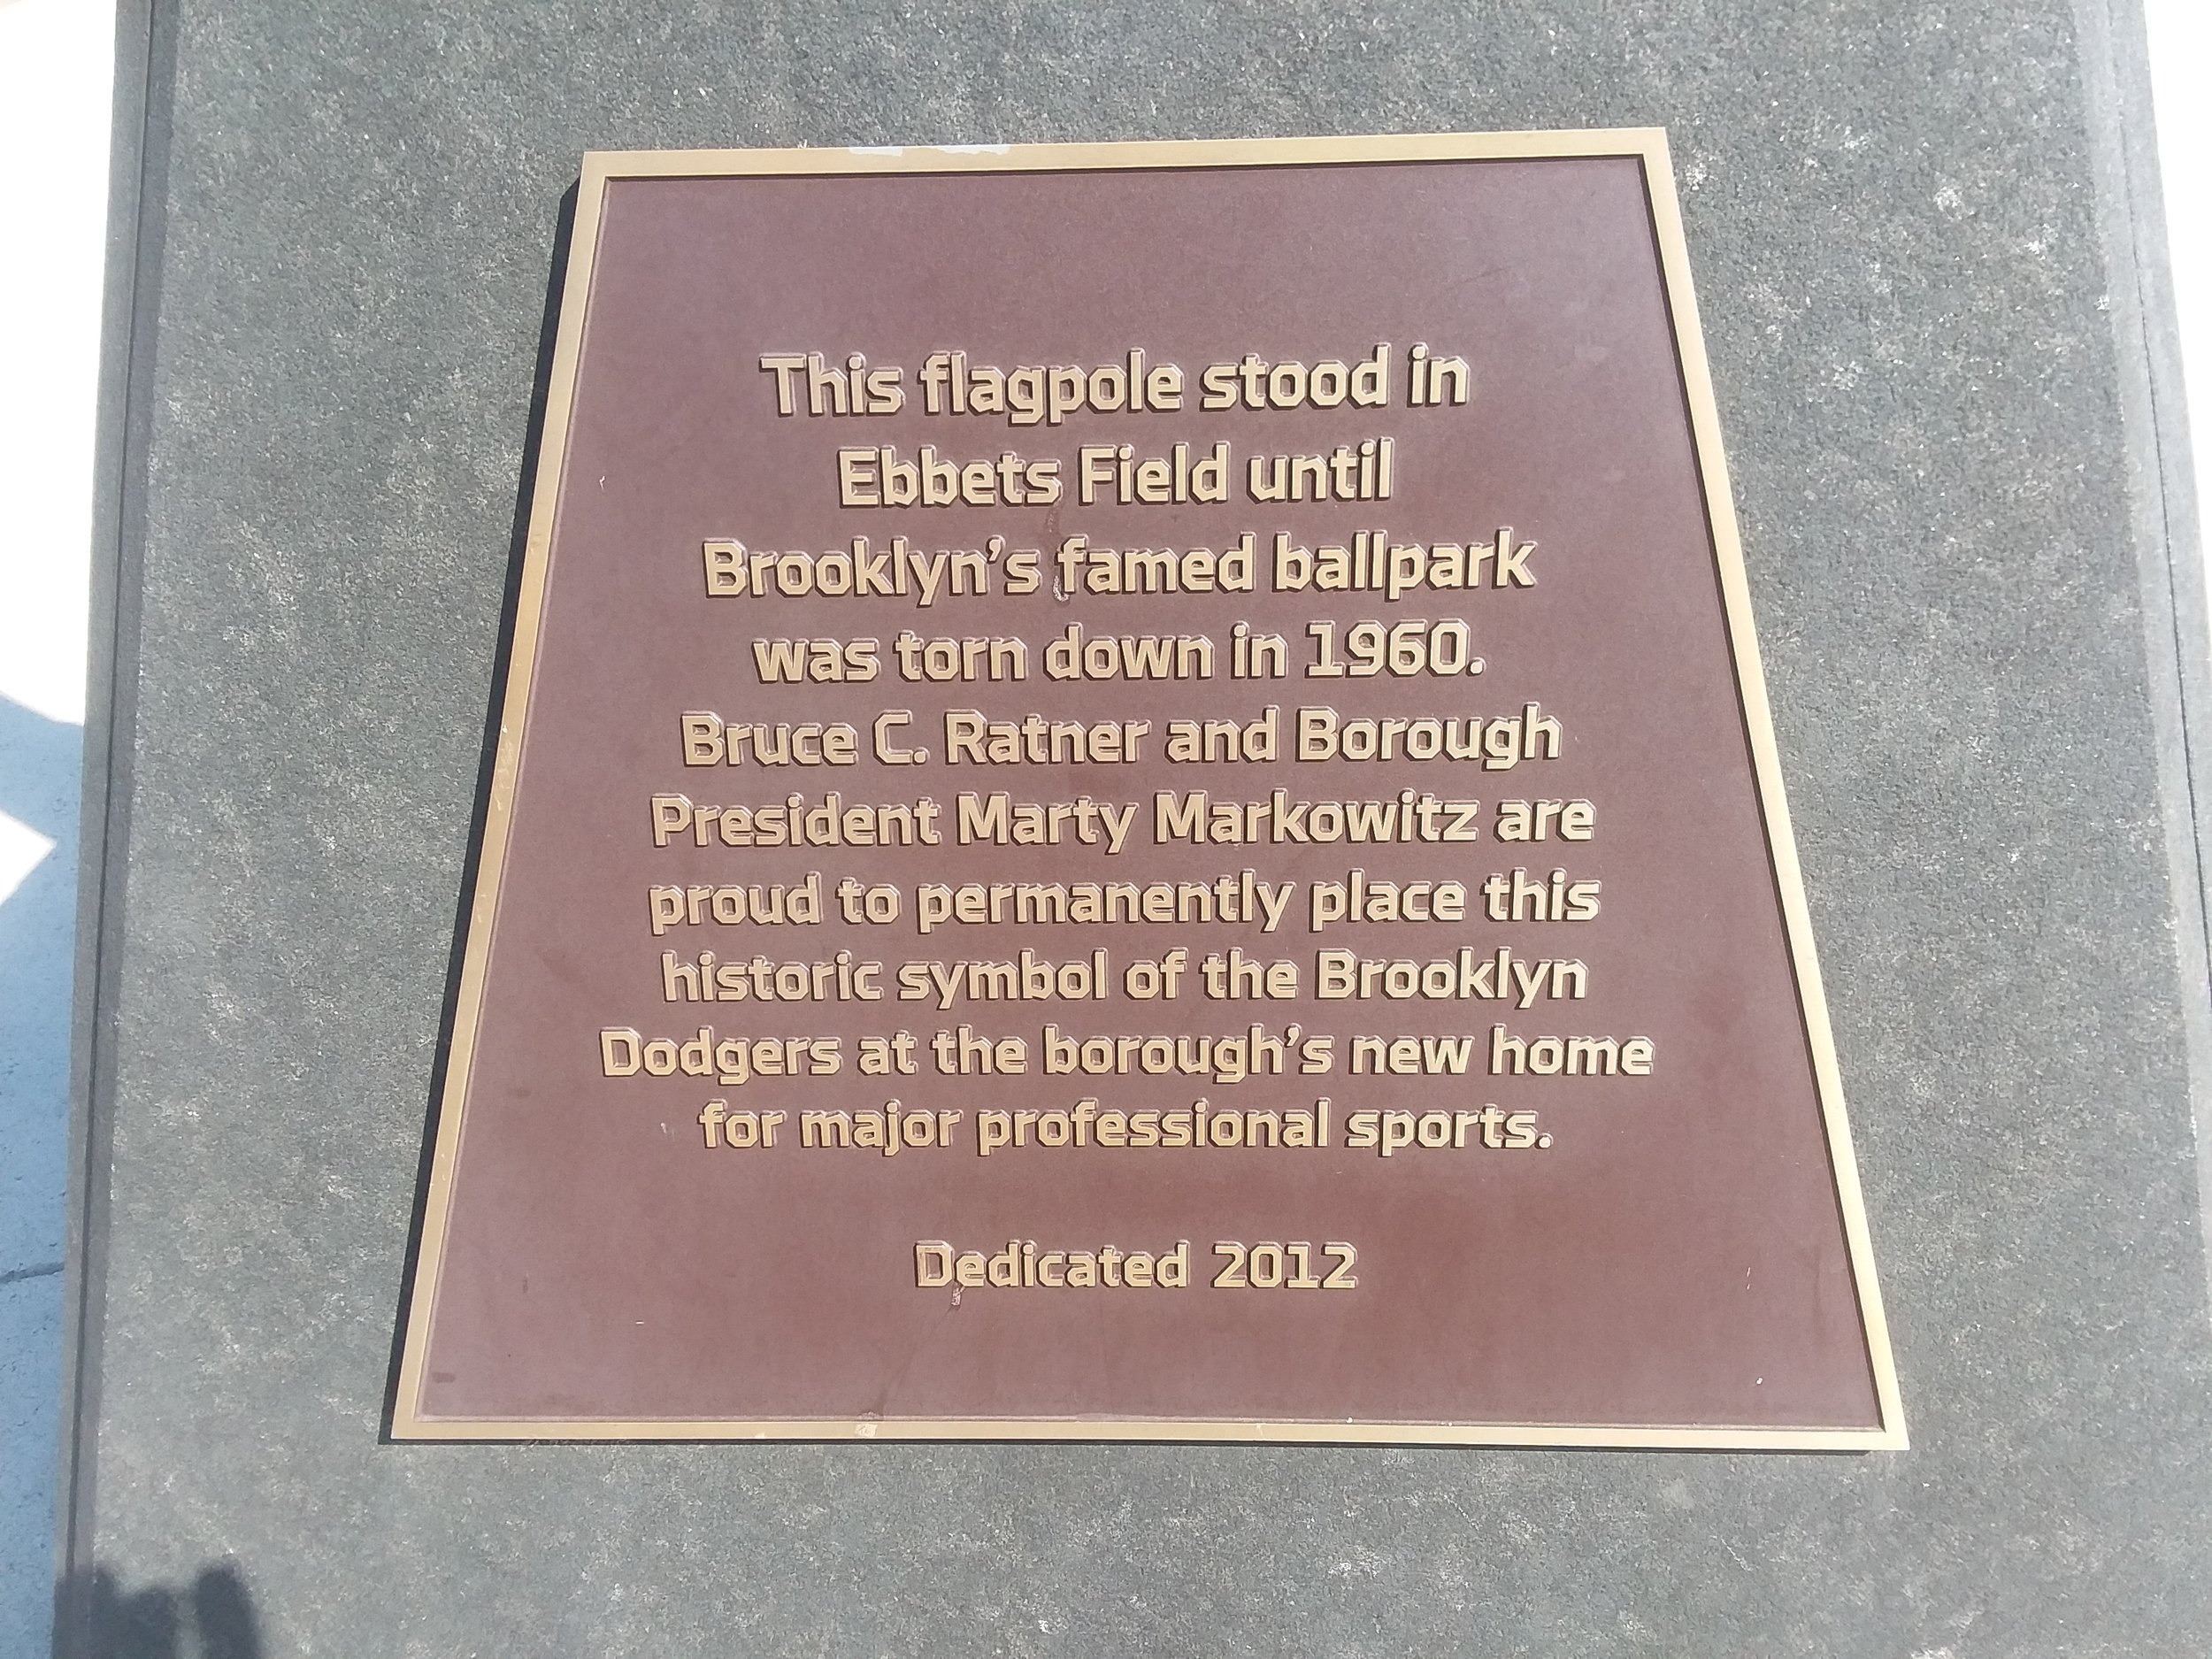 Ebbets Field flagpole base.Photo: Darryl Montgomery, 2017.